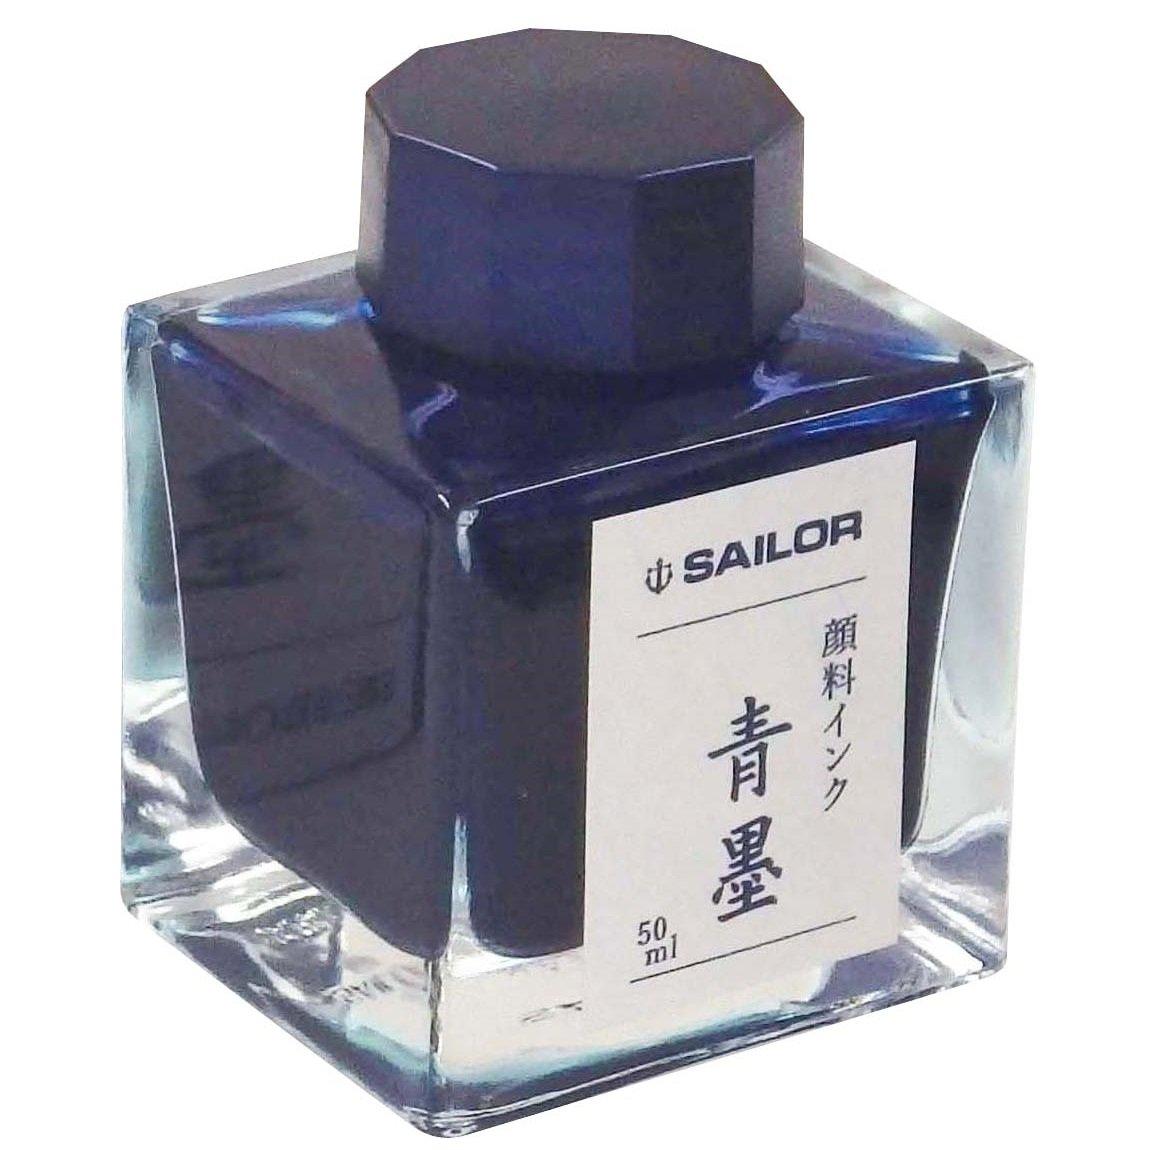 Sailor 50ml Bottled Ink in Seiboku Ultra Blue Black Pigmented for Fountain Pen